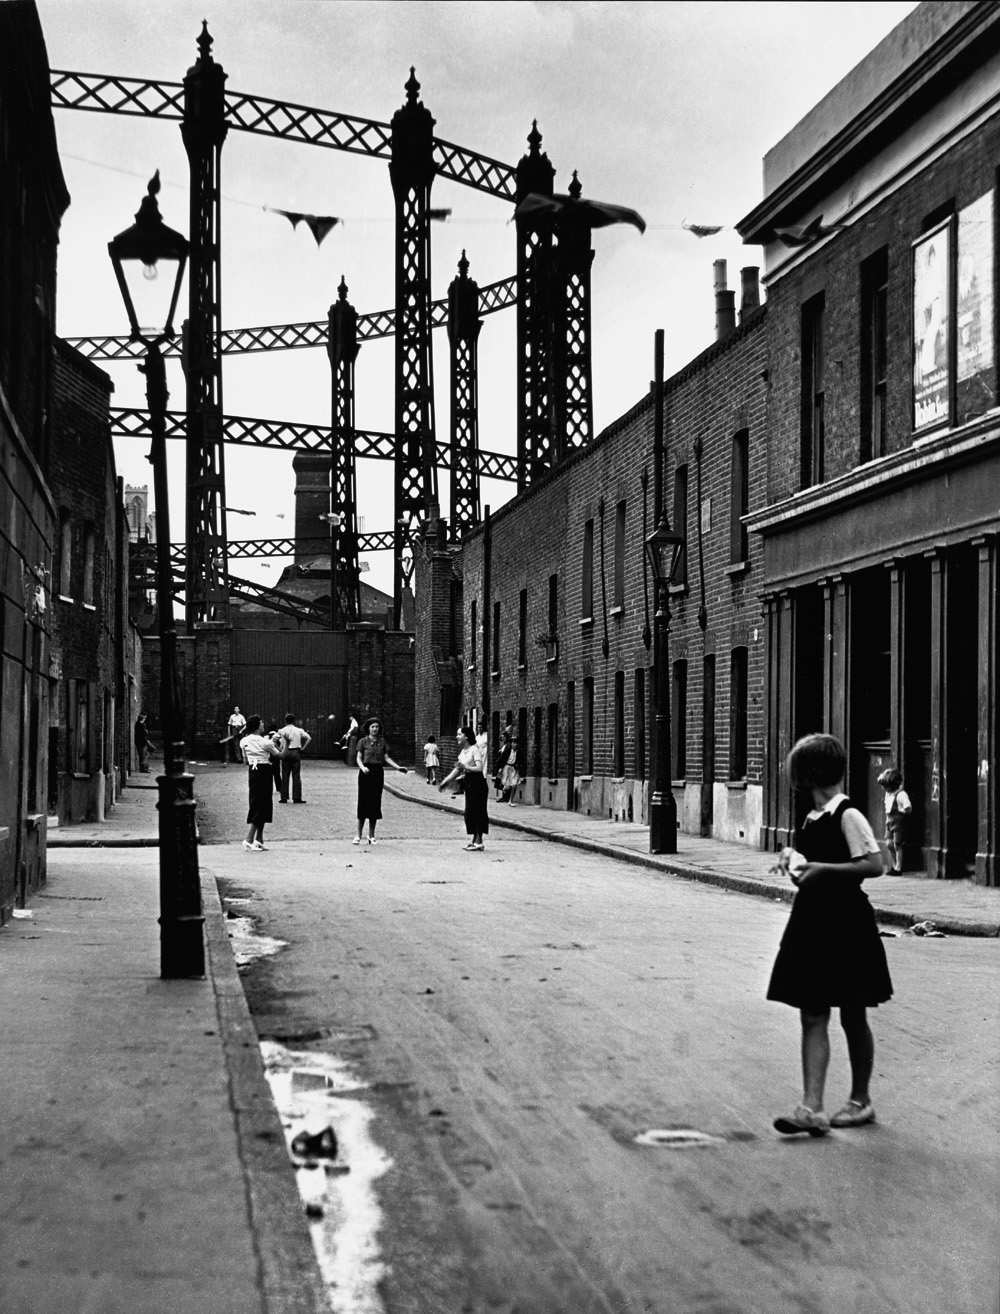 East End London: Enrique Vila-Matas : An English Page